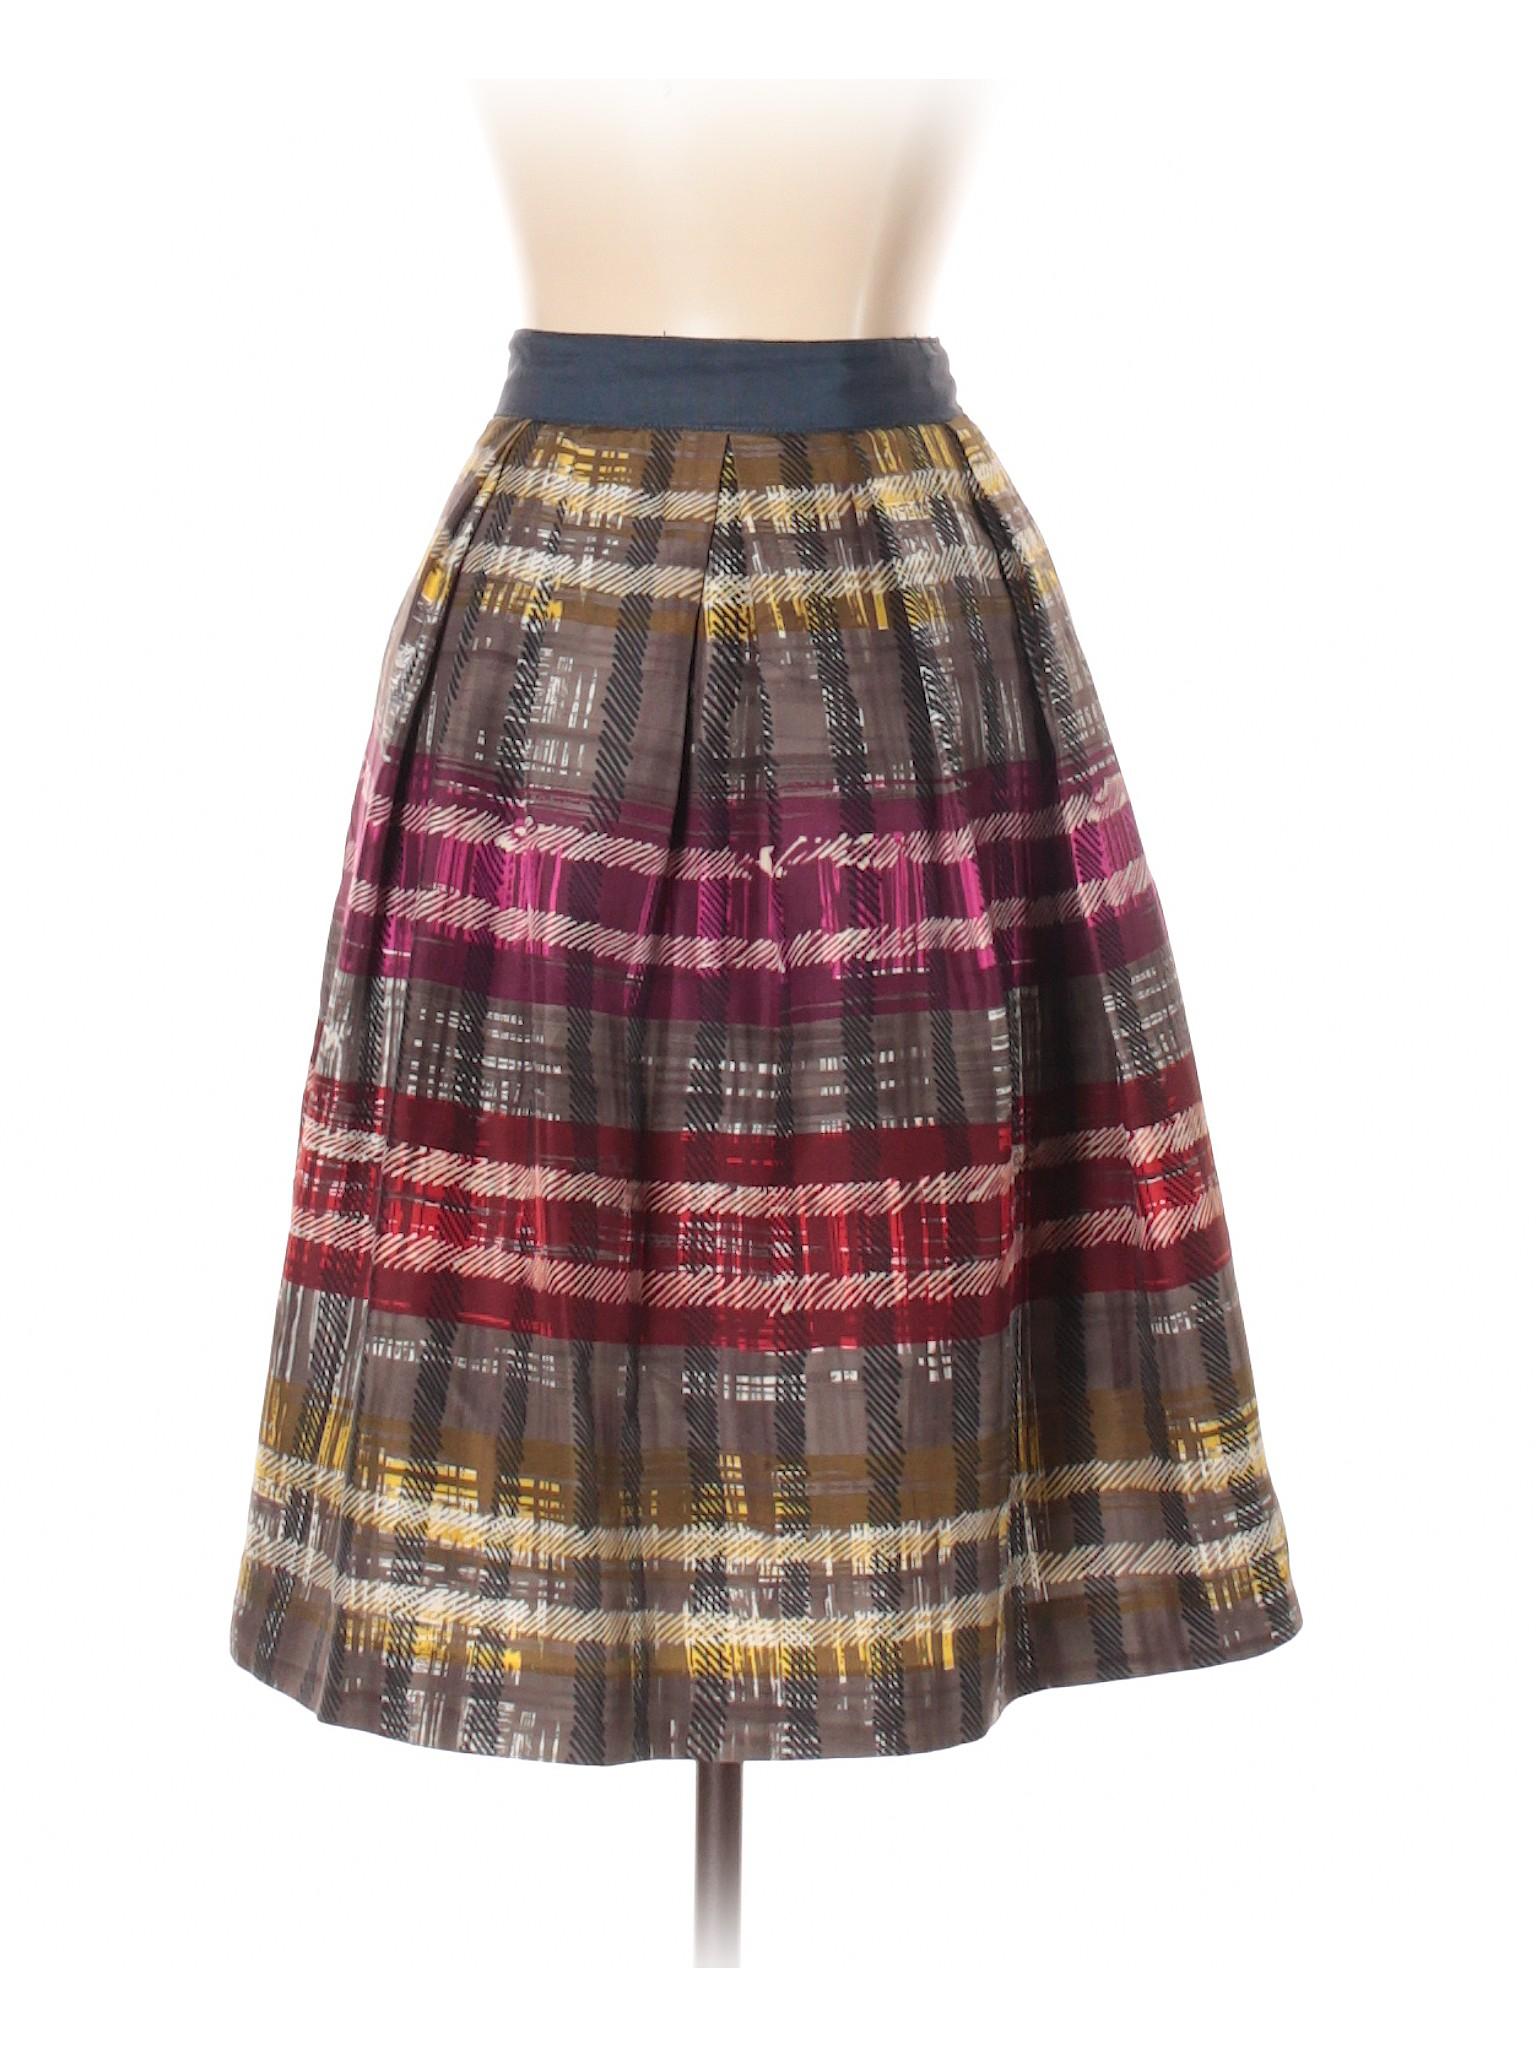 Turk Boutique Boutique Skirt Trina Trina Silk w7PtFq